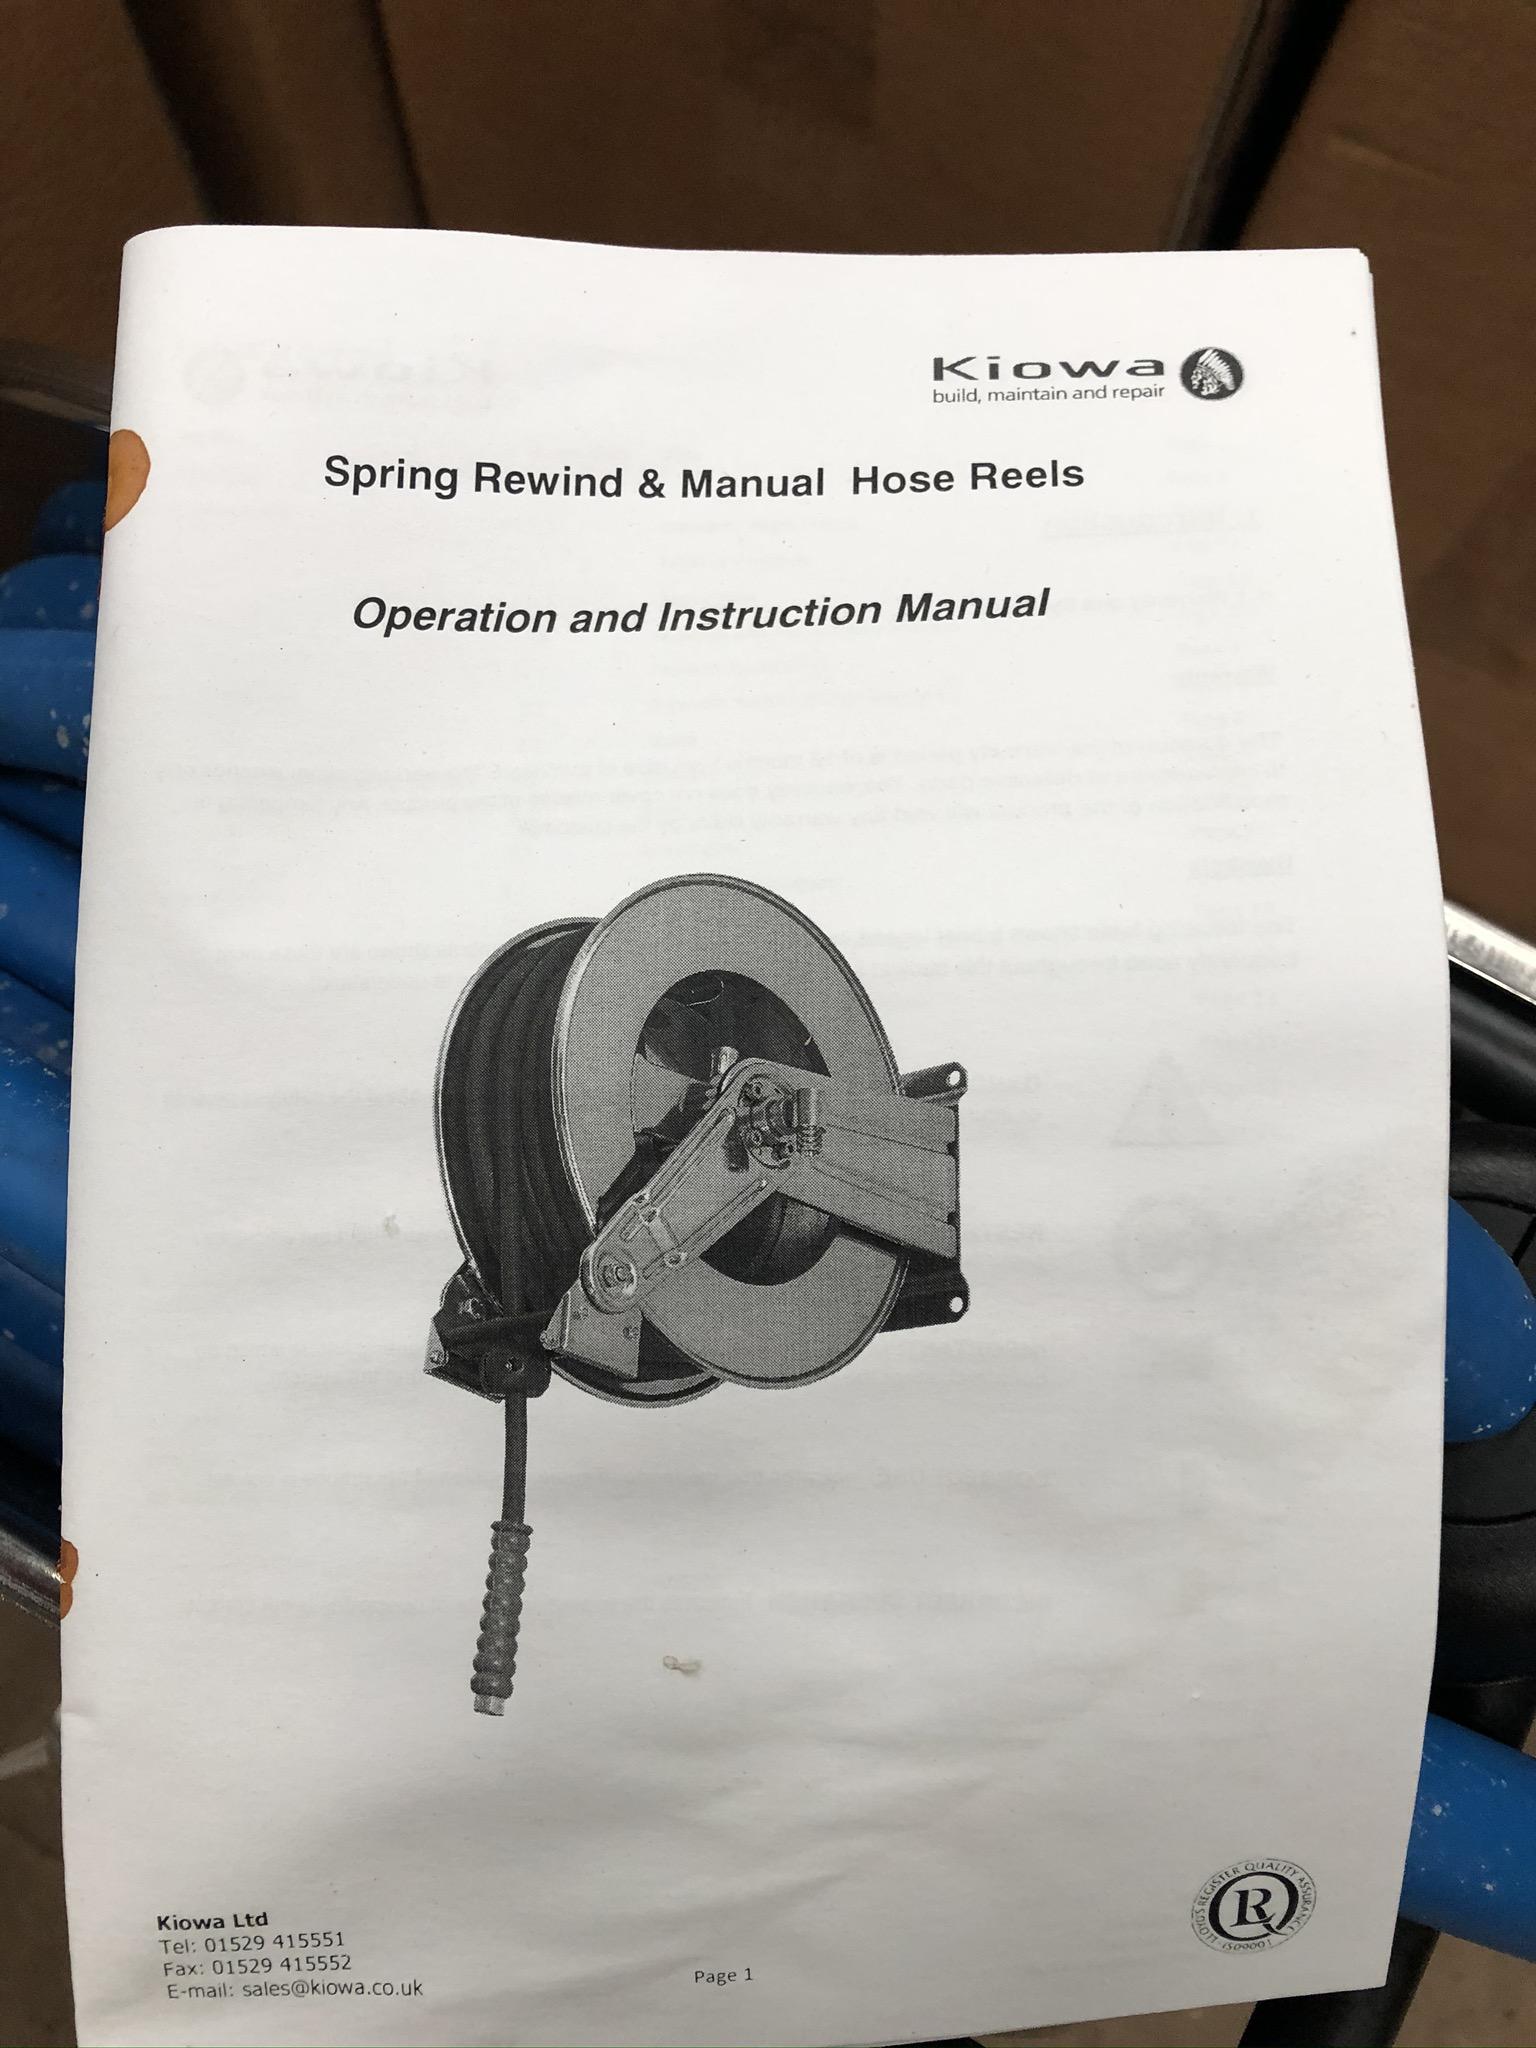 Lot 60 - Kiowa Spring Rewind & Manual Hose Reel, plant no.